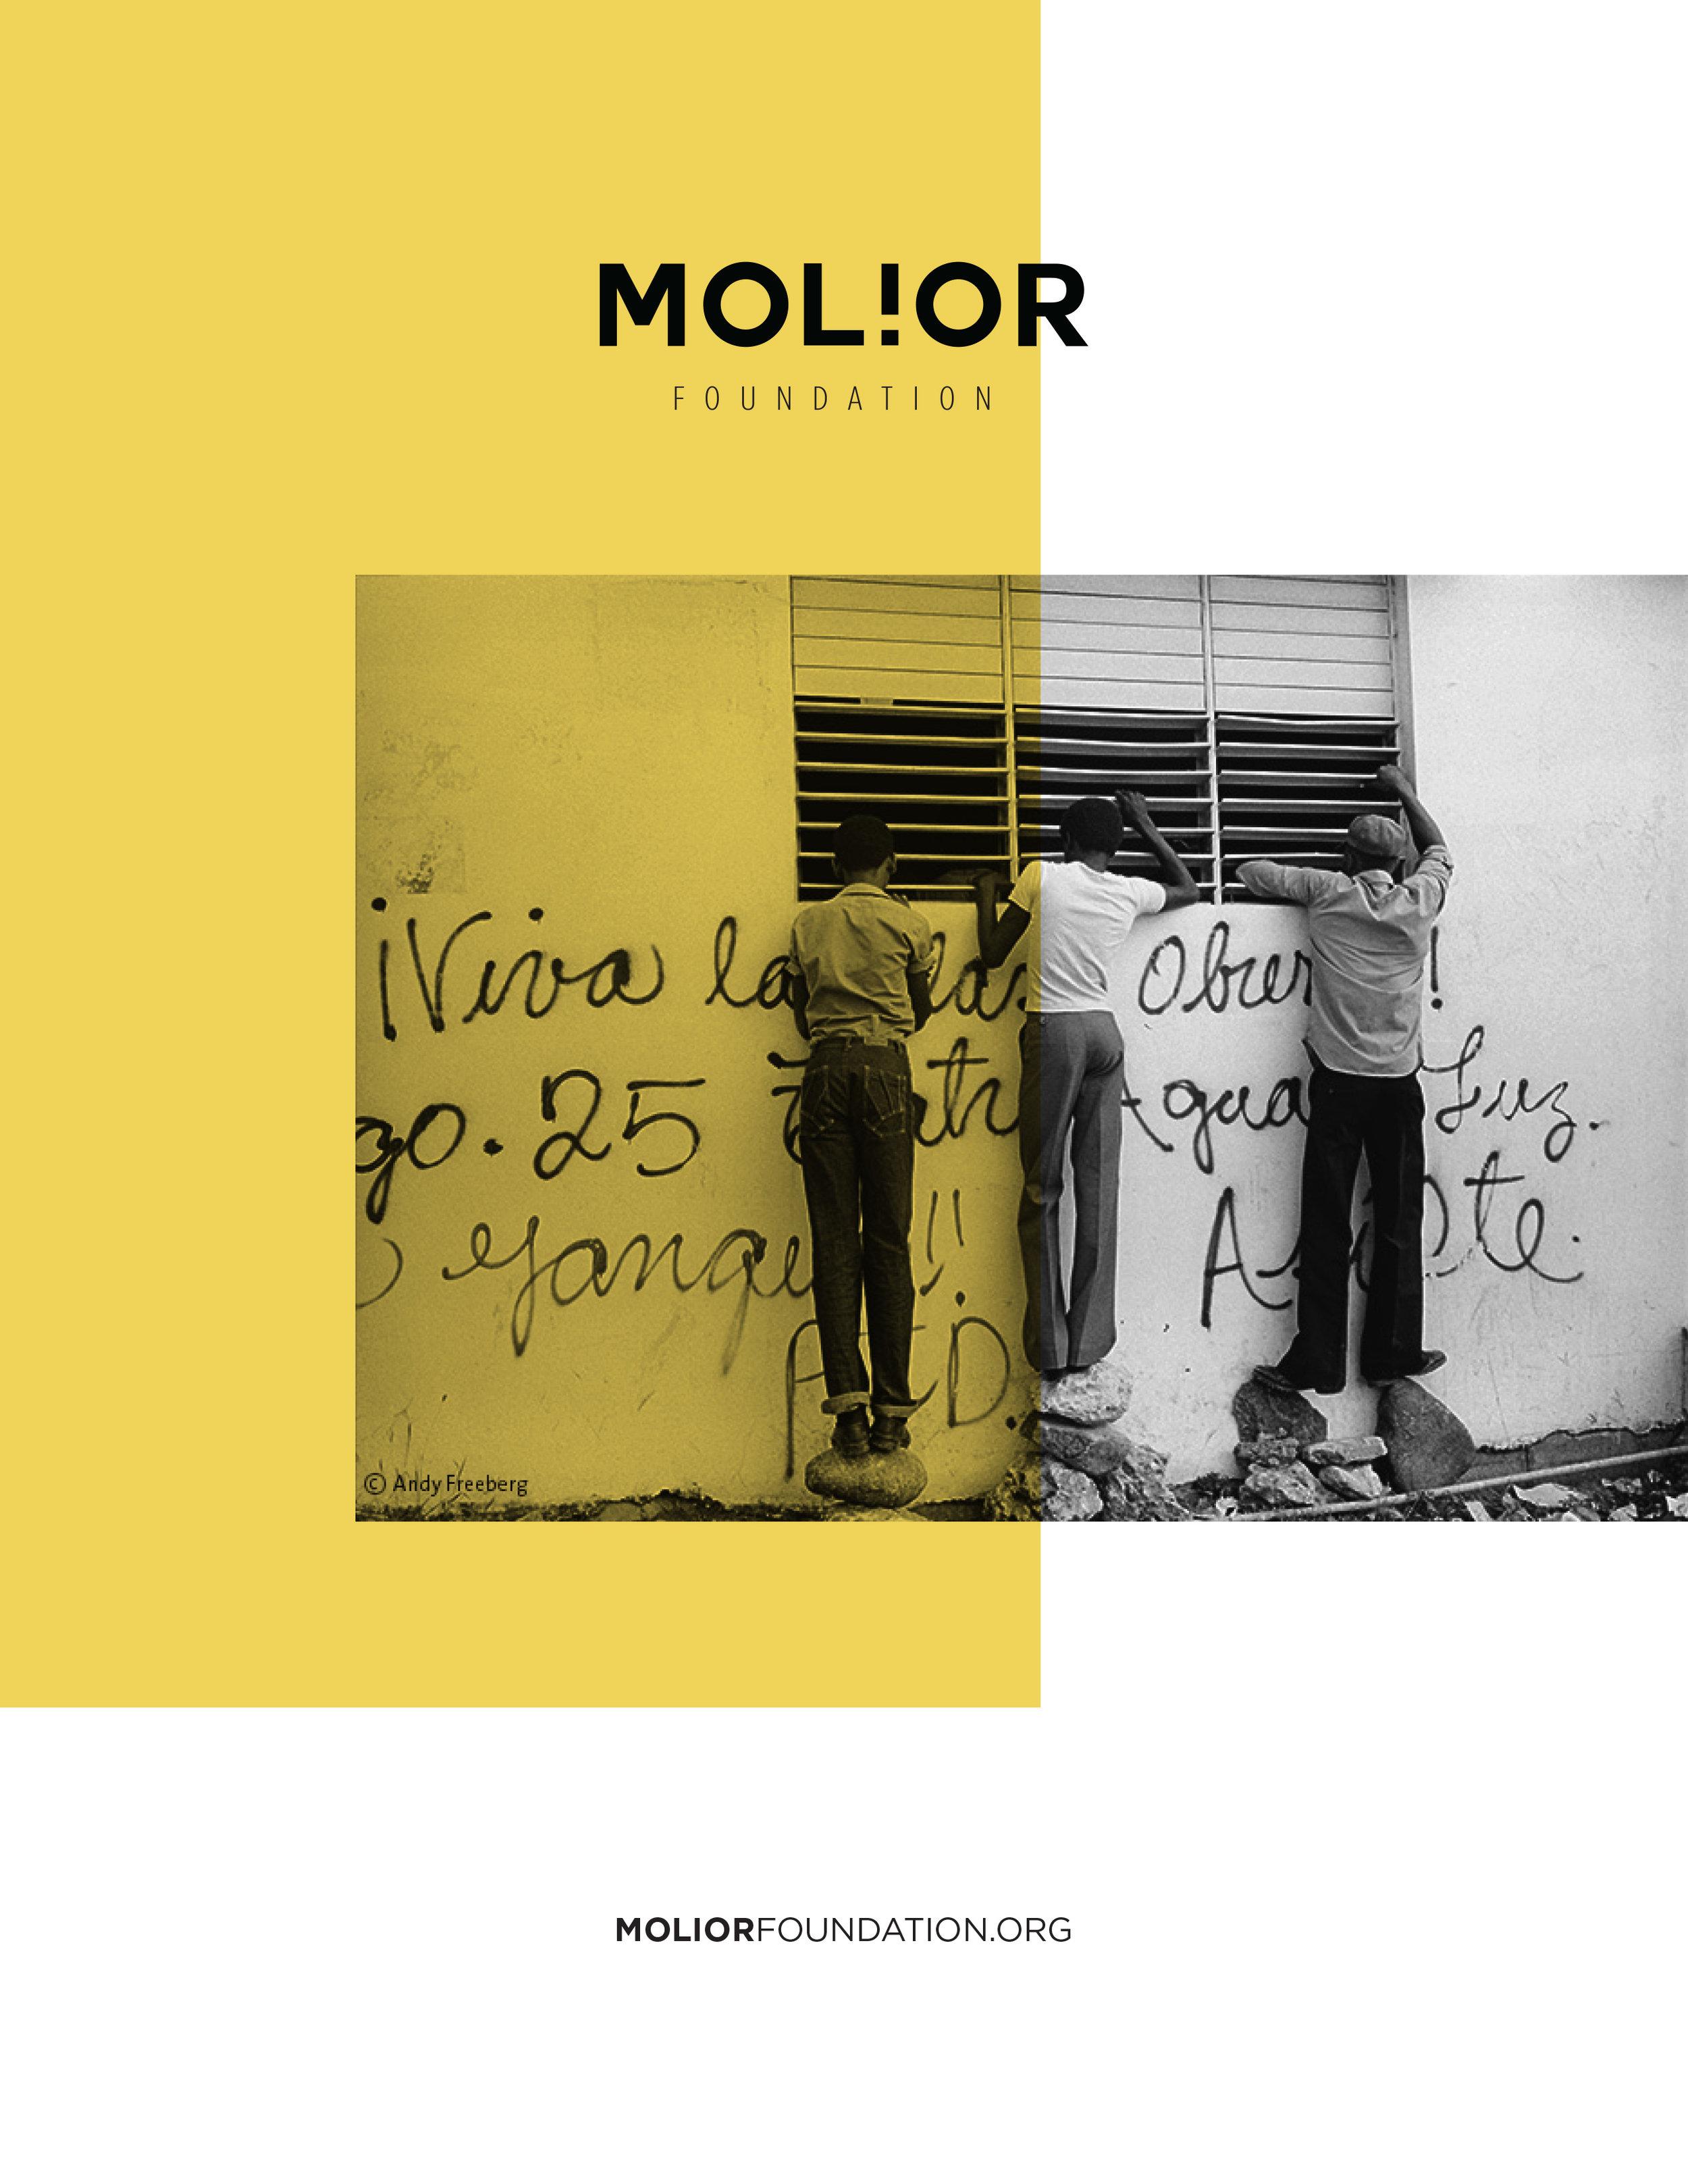 MOLIOR_Intro-6.jpg